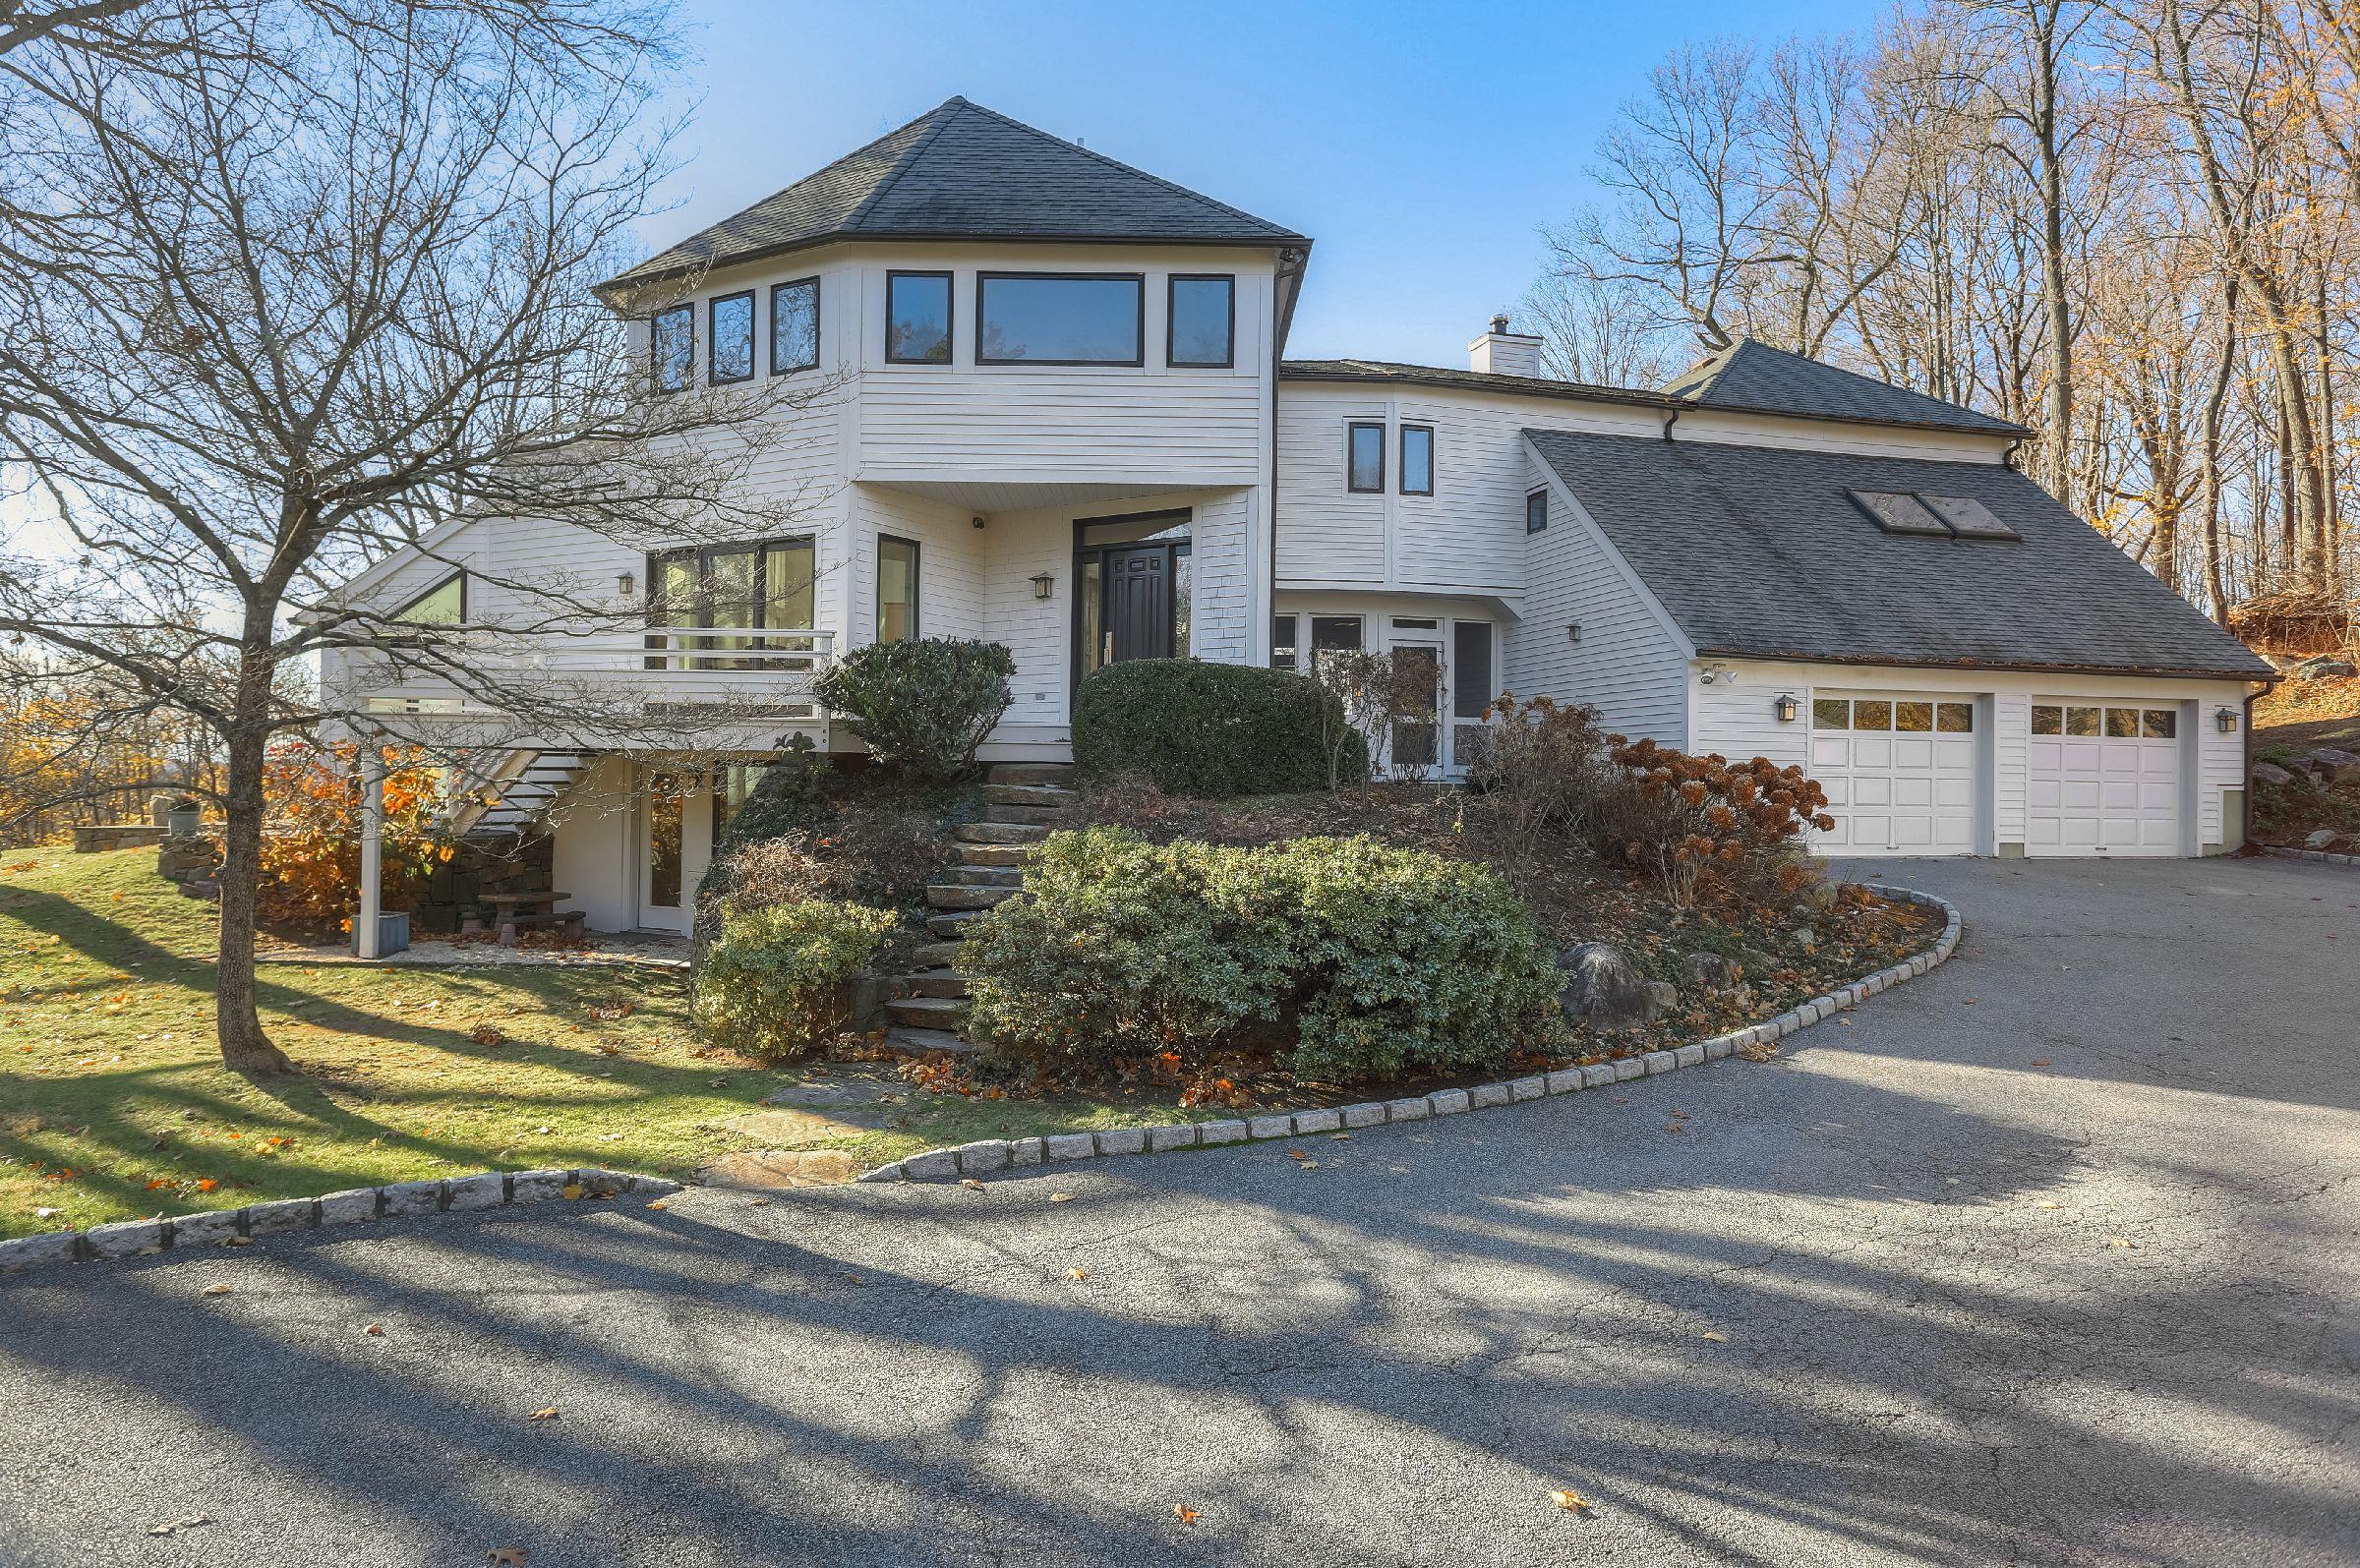 114 Byram Lake Road, Mount Kisco, NY - USA (photo 1)